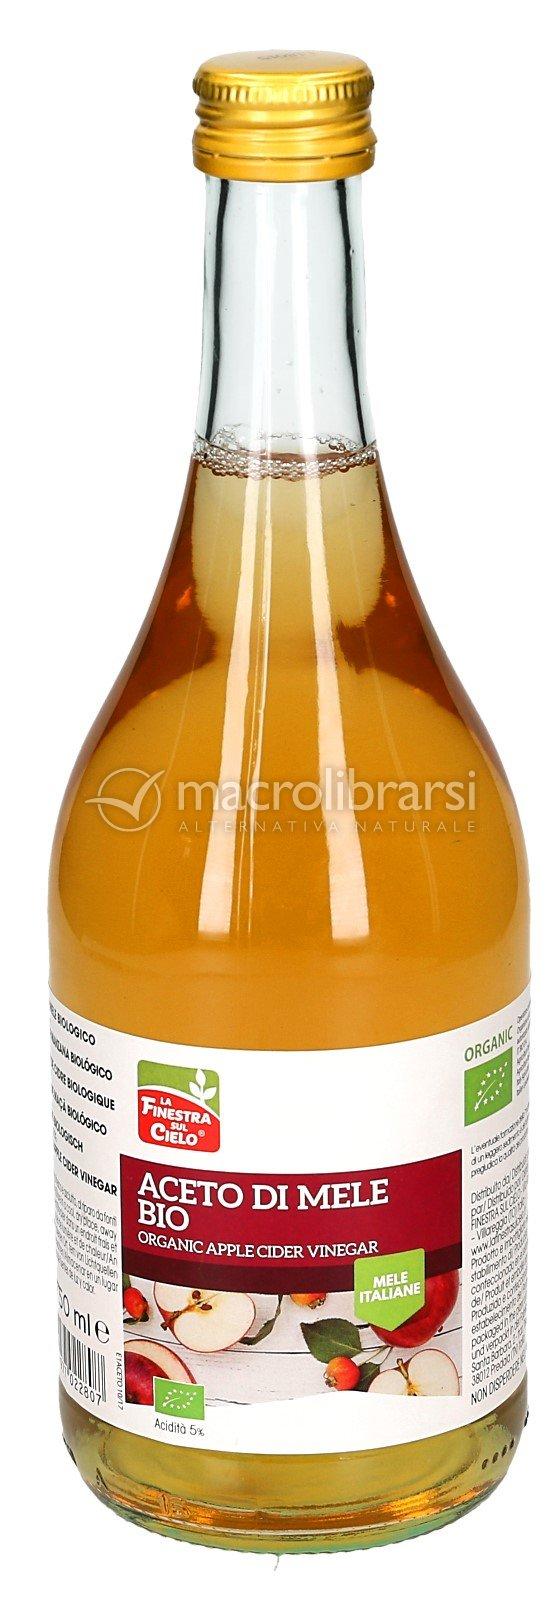 Aceto di Mele - Bio Med